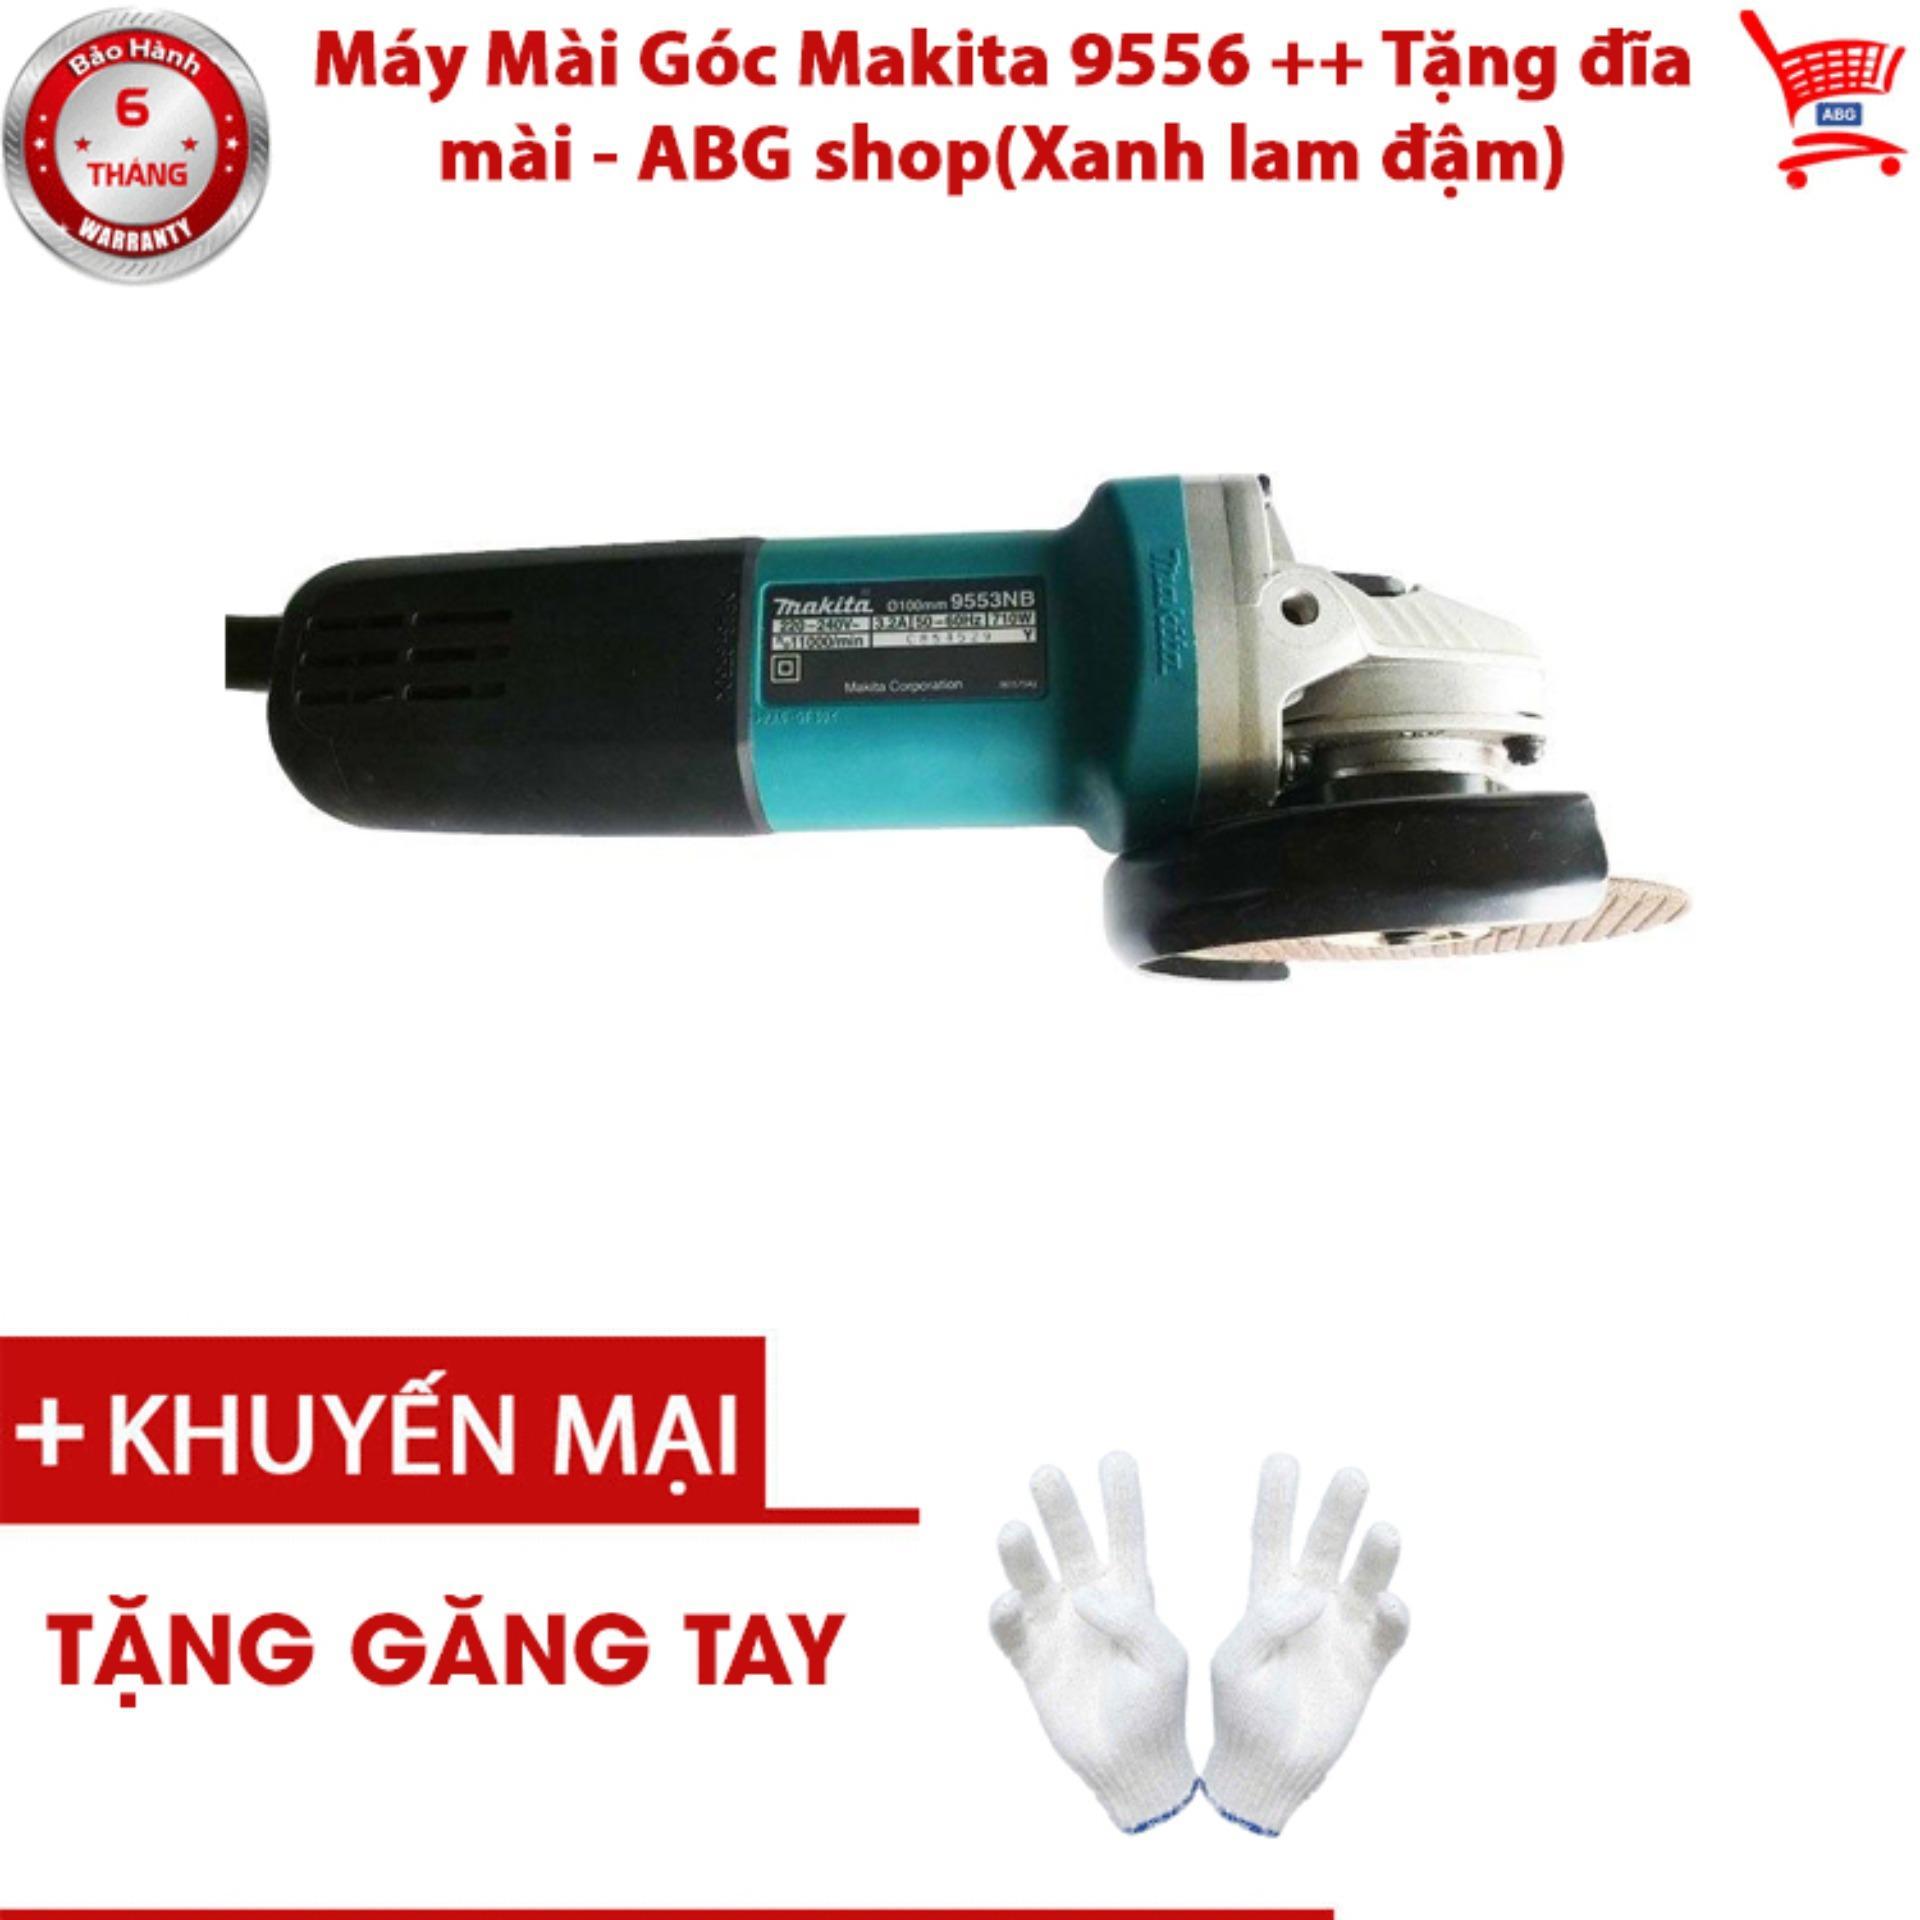 Máy Mài Góc Makita 9556 ++ Tặng đĩa mài - ABG shop